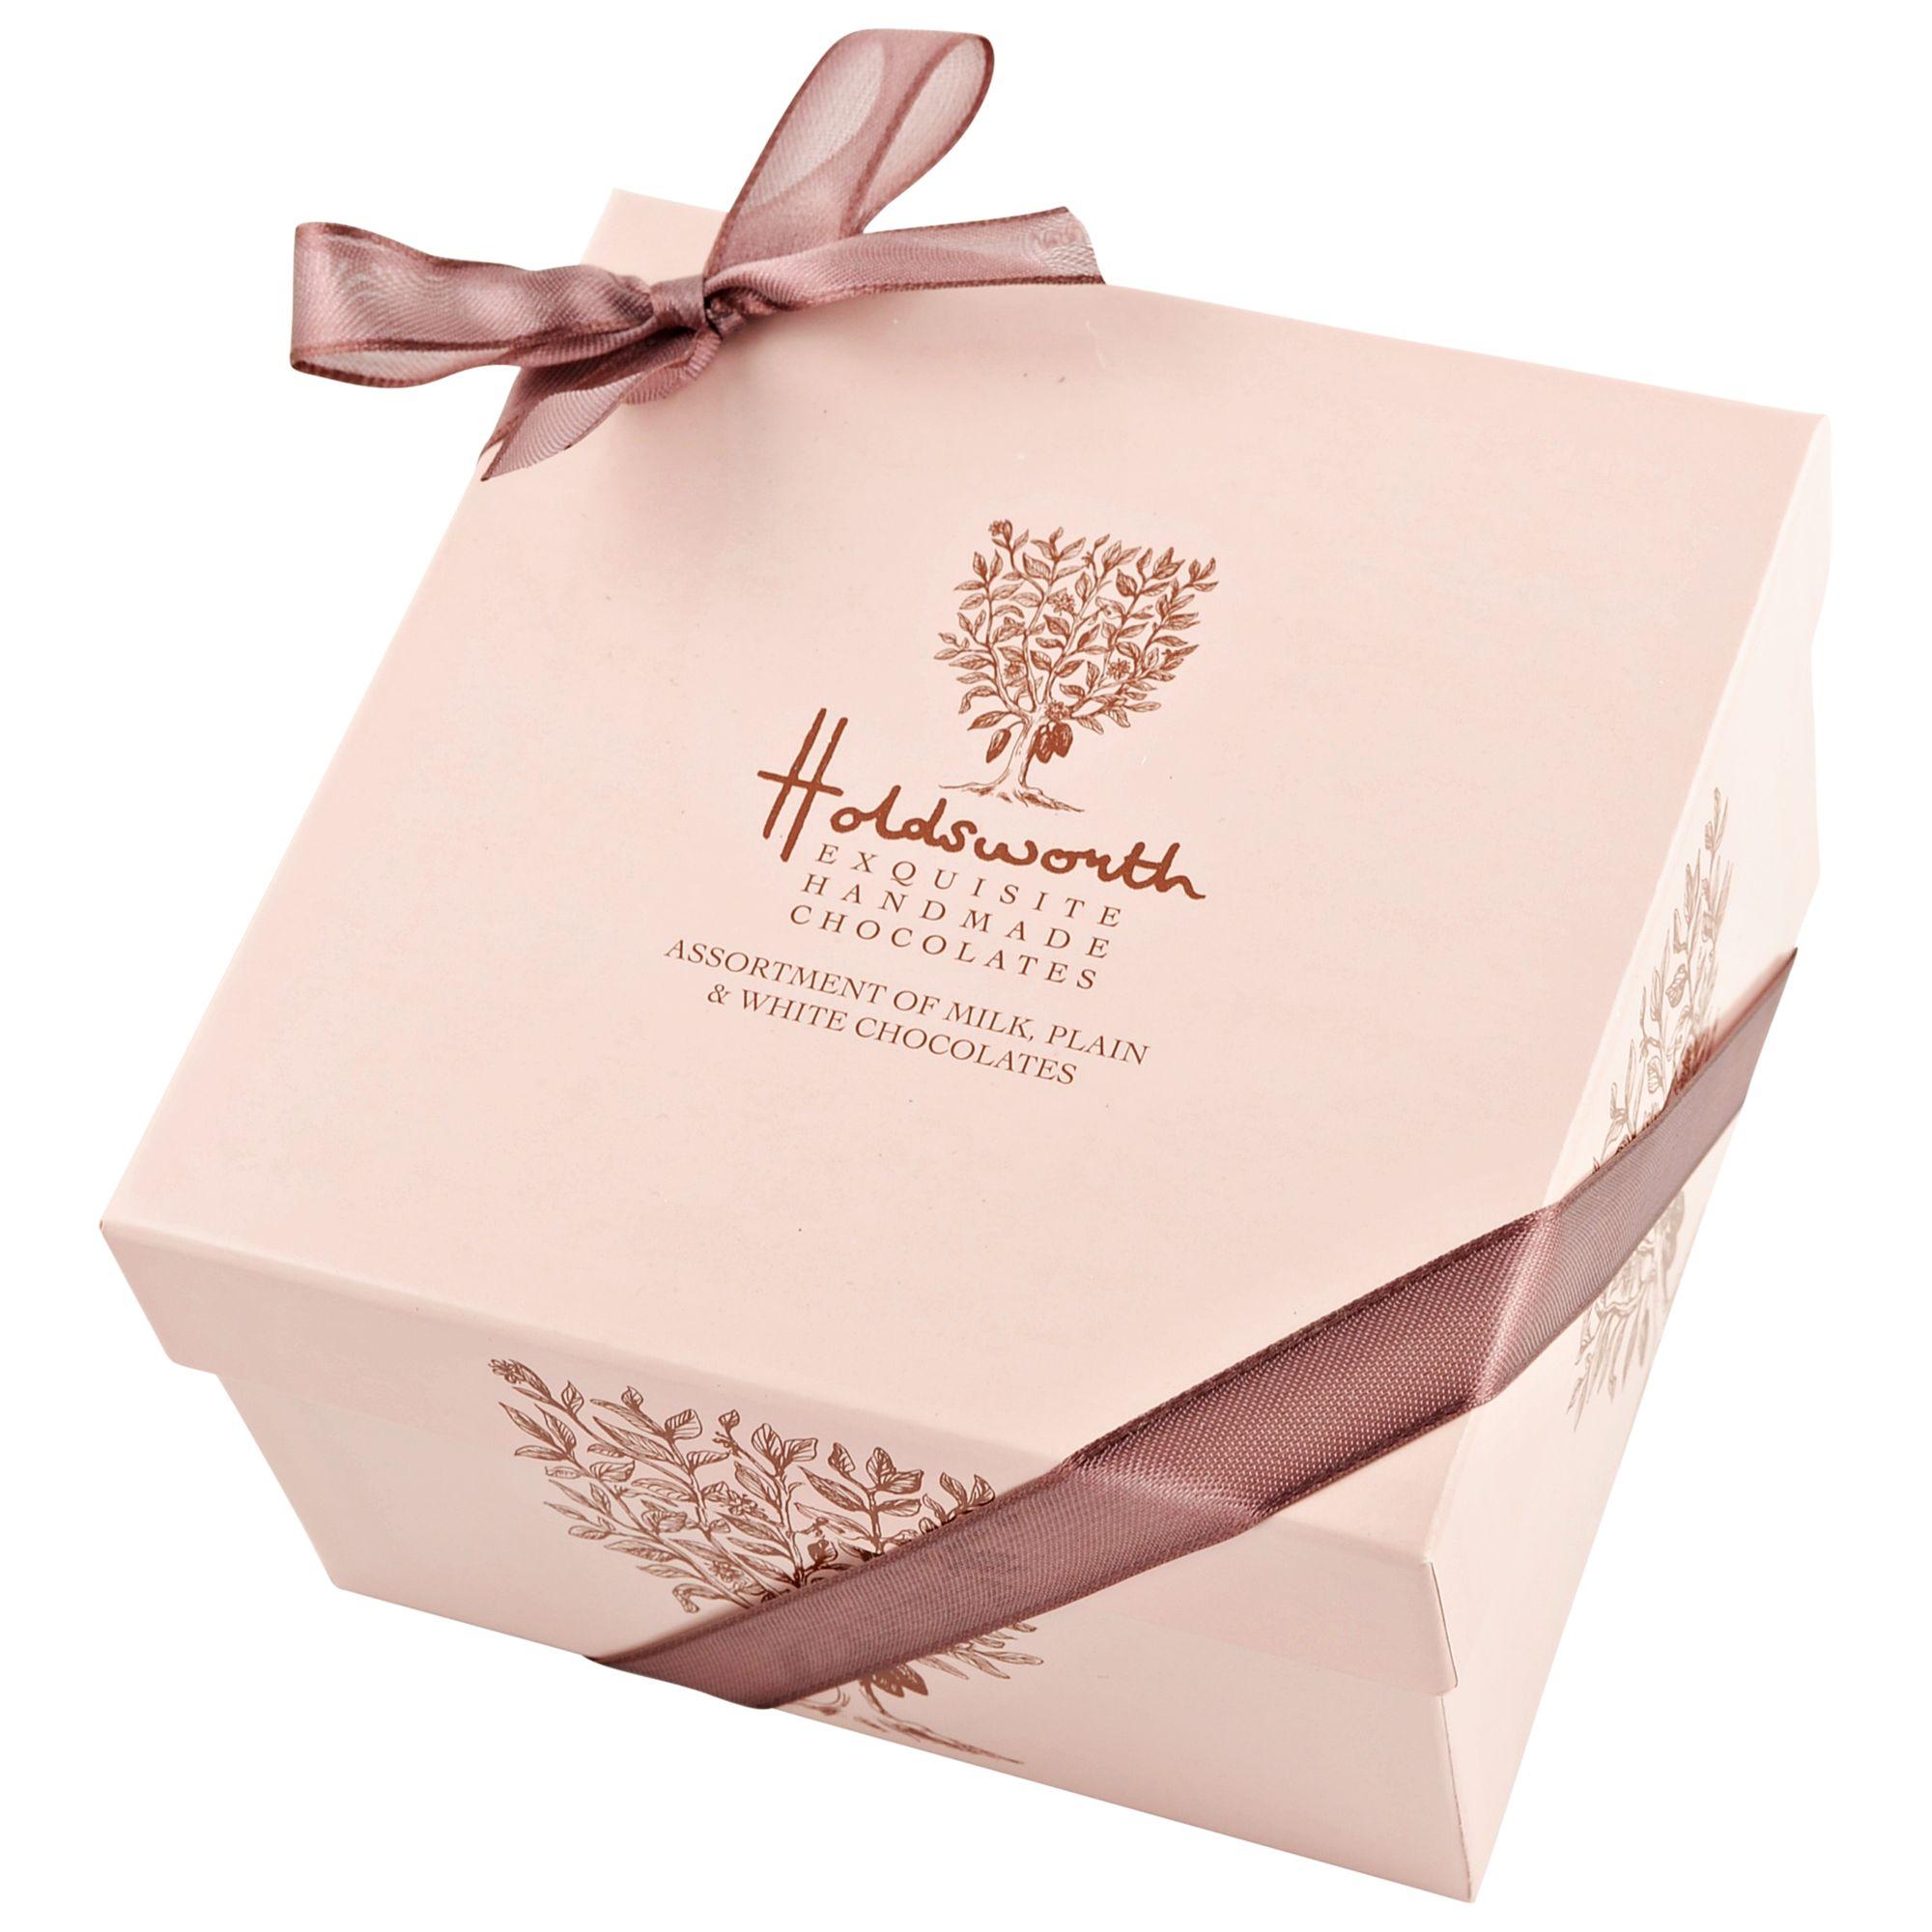 John Lewis Wedding Gift Box : Luxury Fairtrade Organic Chocolate Easter Egg Hampers